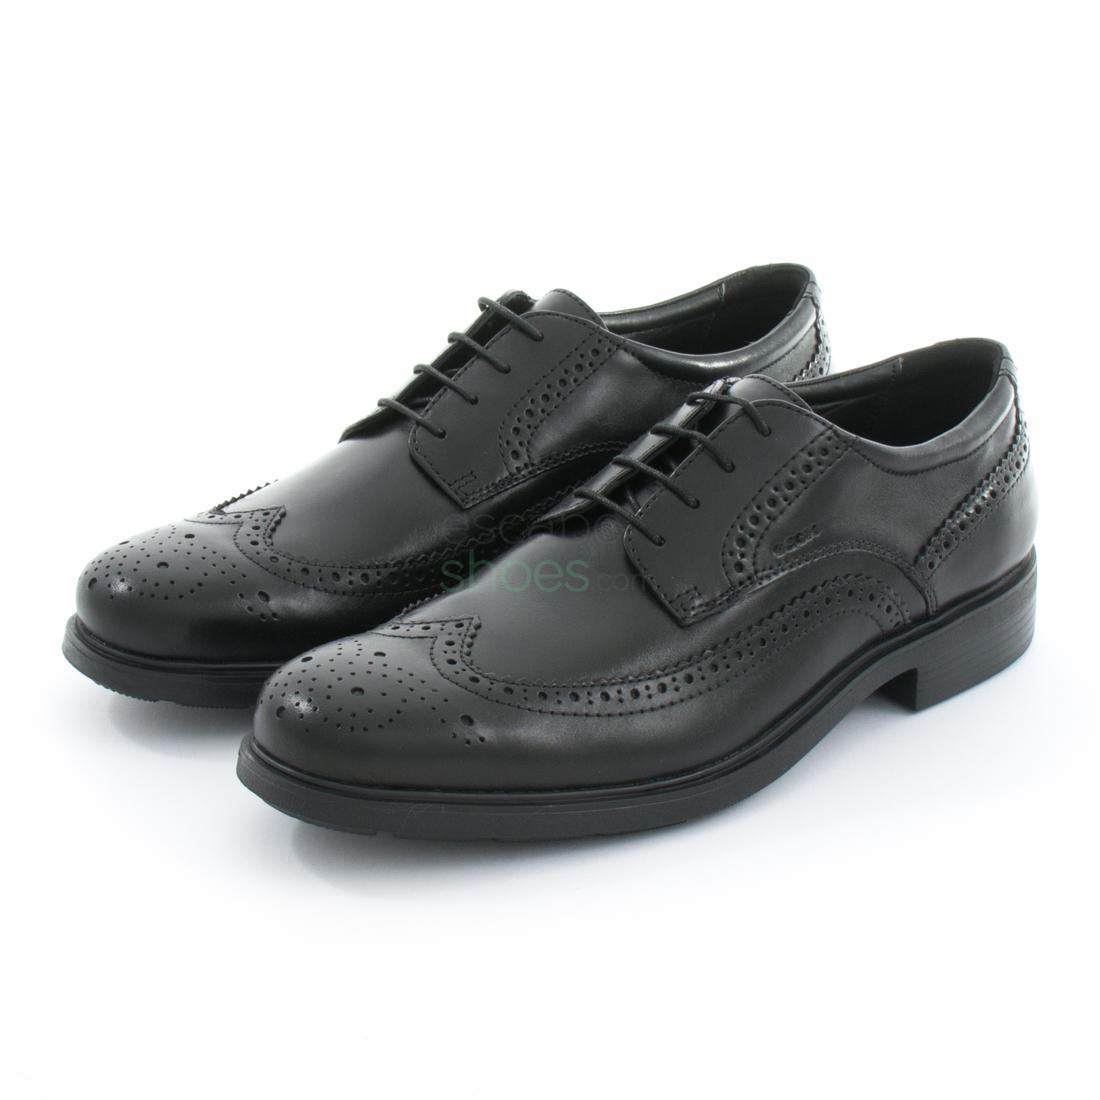 Tus C9999 U34r2b Dublin 00043 Aquí Zapatos Geox Black Compra JuFc3K5Tl1